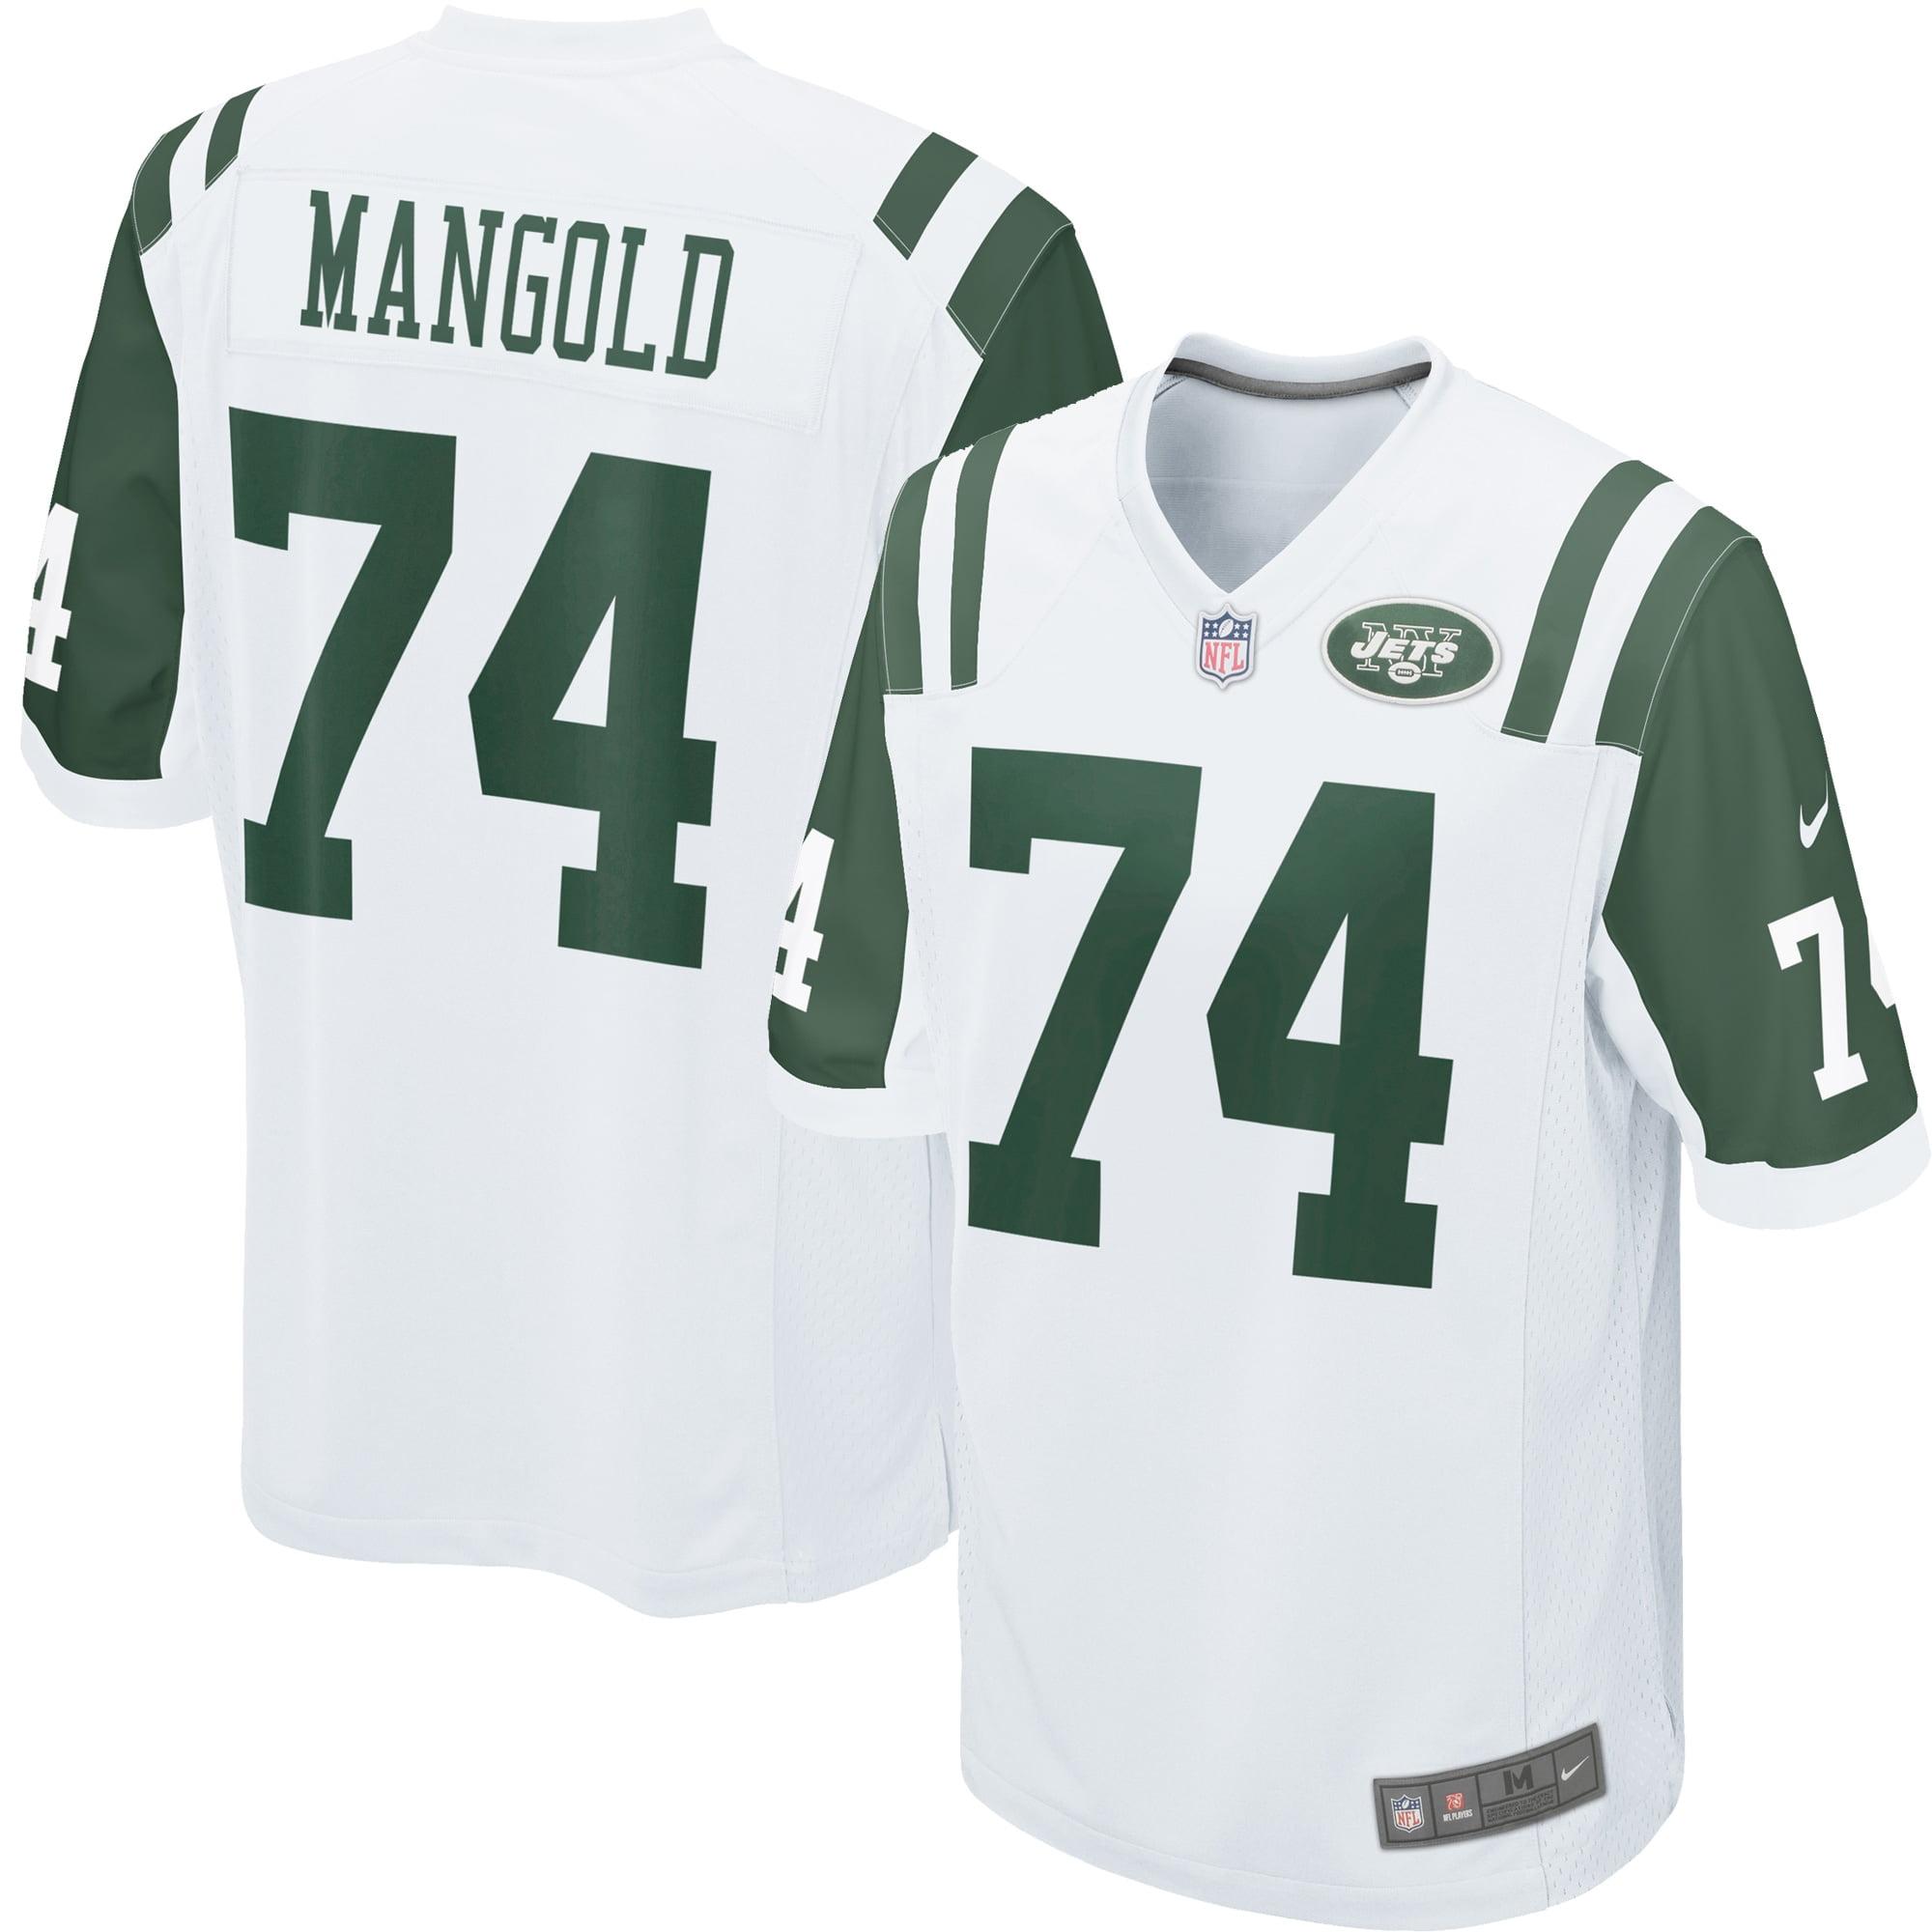 Nick Mangold New York Jets Nike Youth Game Jersey - White - Walmart.com